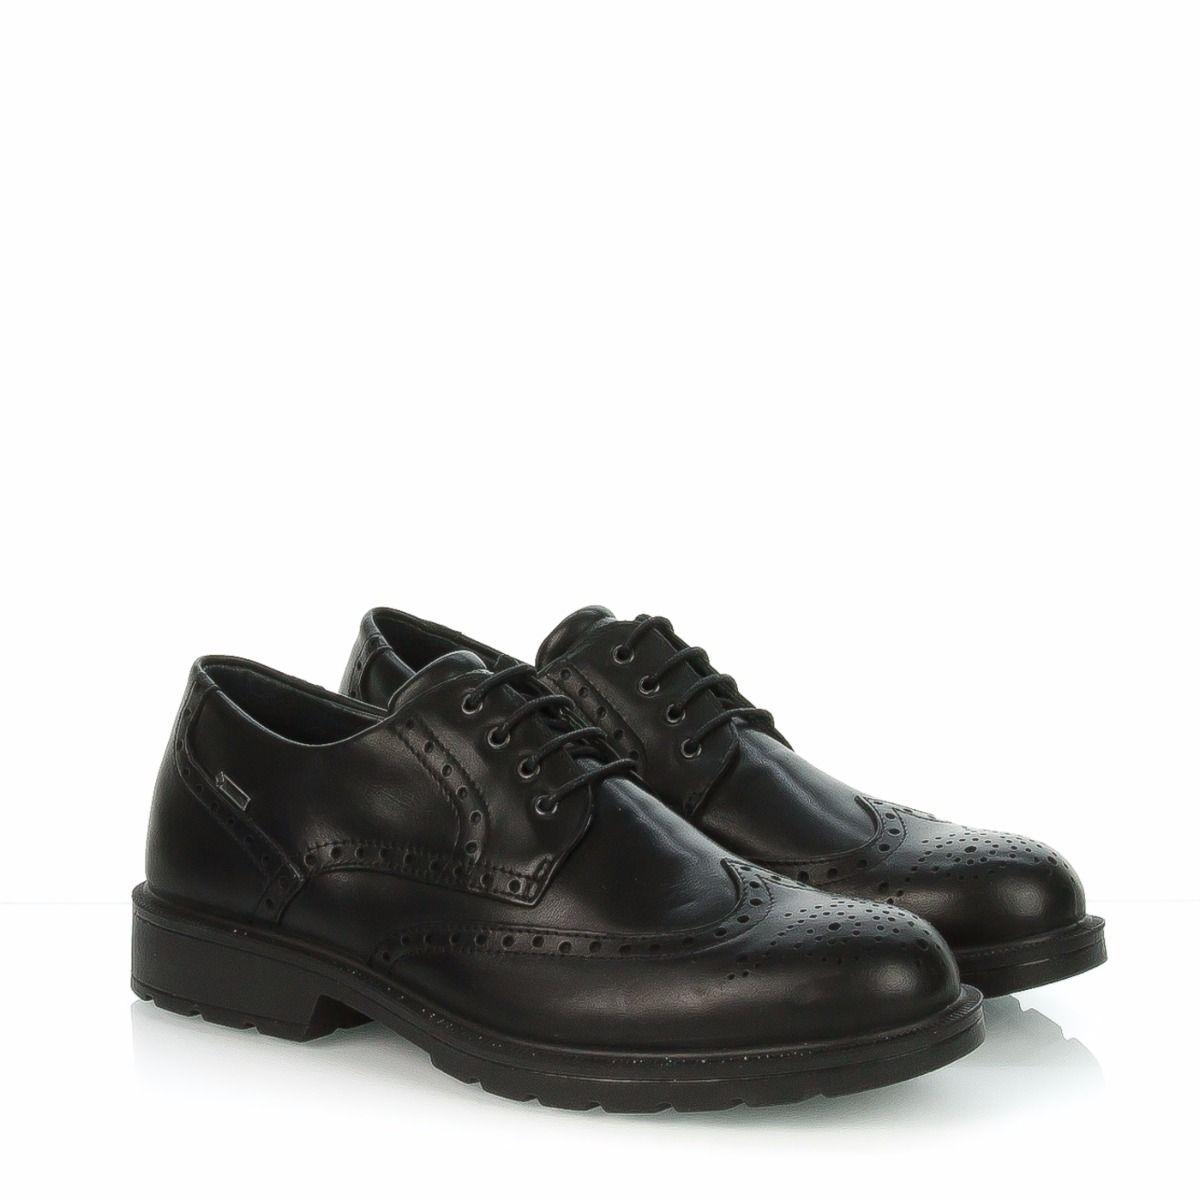 Scarpa stringata da uomo IGI CO 86750-00 in pelle nero inglese Gore-tex®   2872d246093